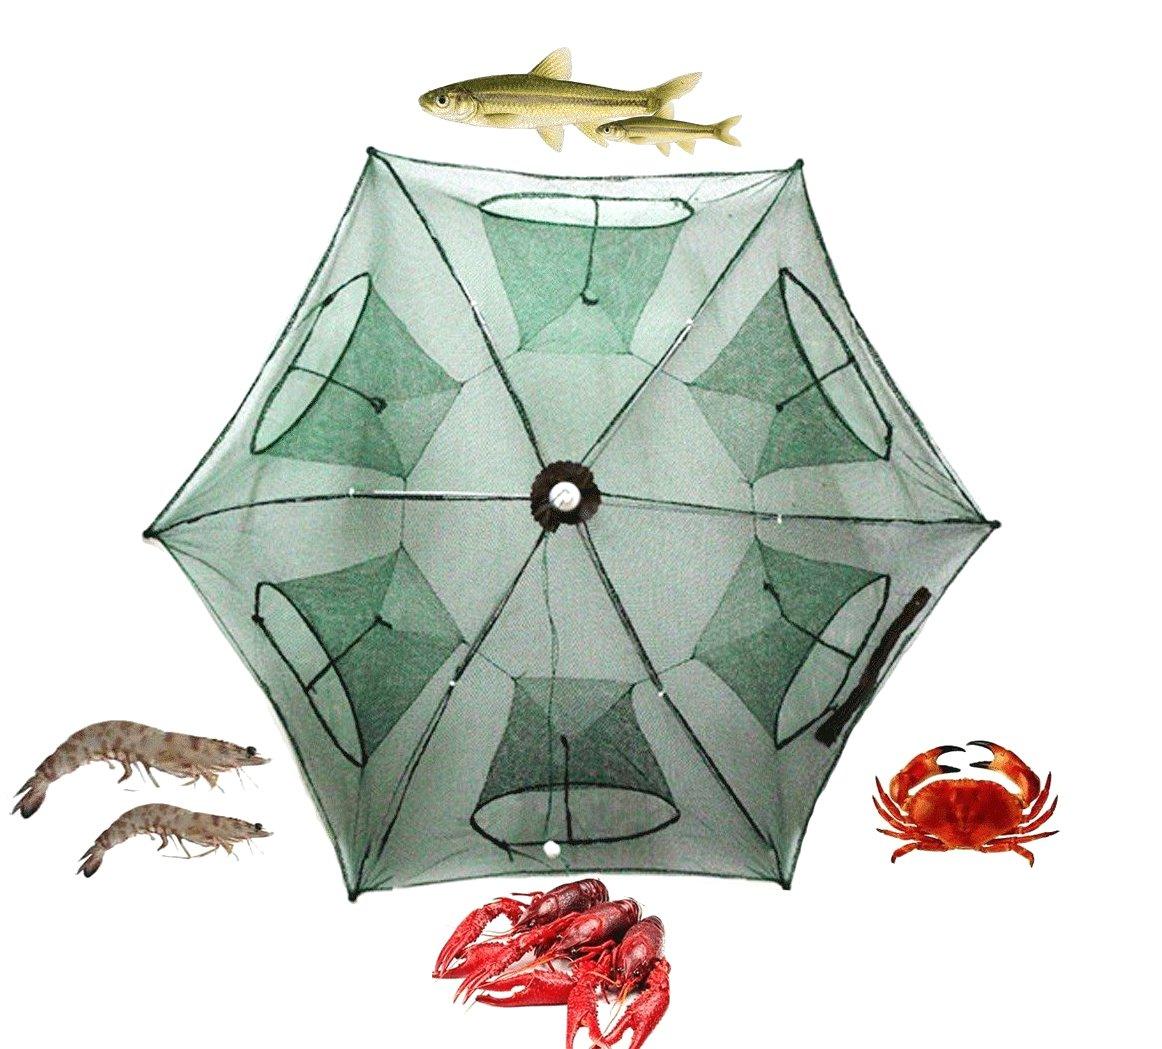 Fishing Net, PeachFYE Foldable Fish Shrimp Crab Minnow Crawfish Crab Baits Cast Mesh Trap Neit Cage B01NH02VM7